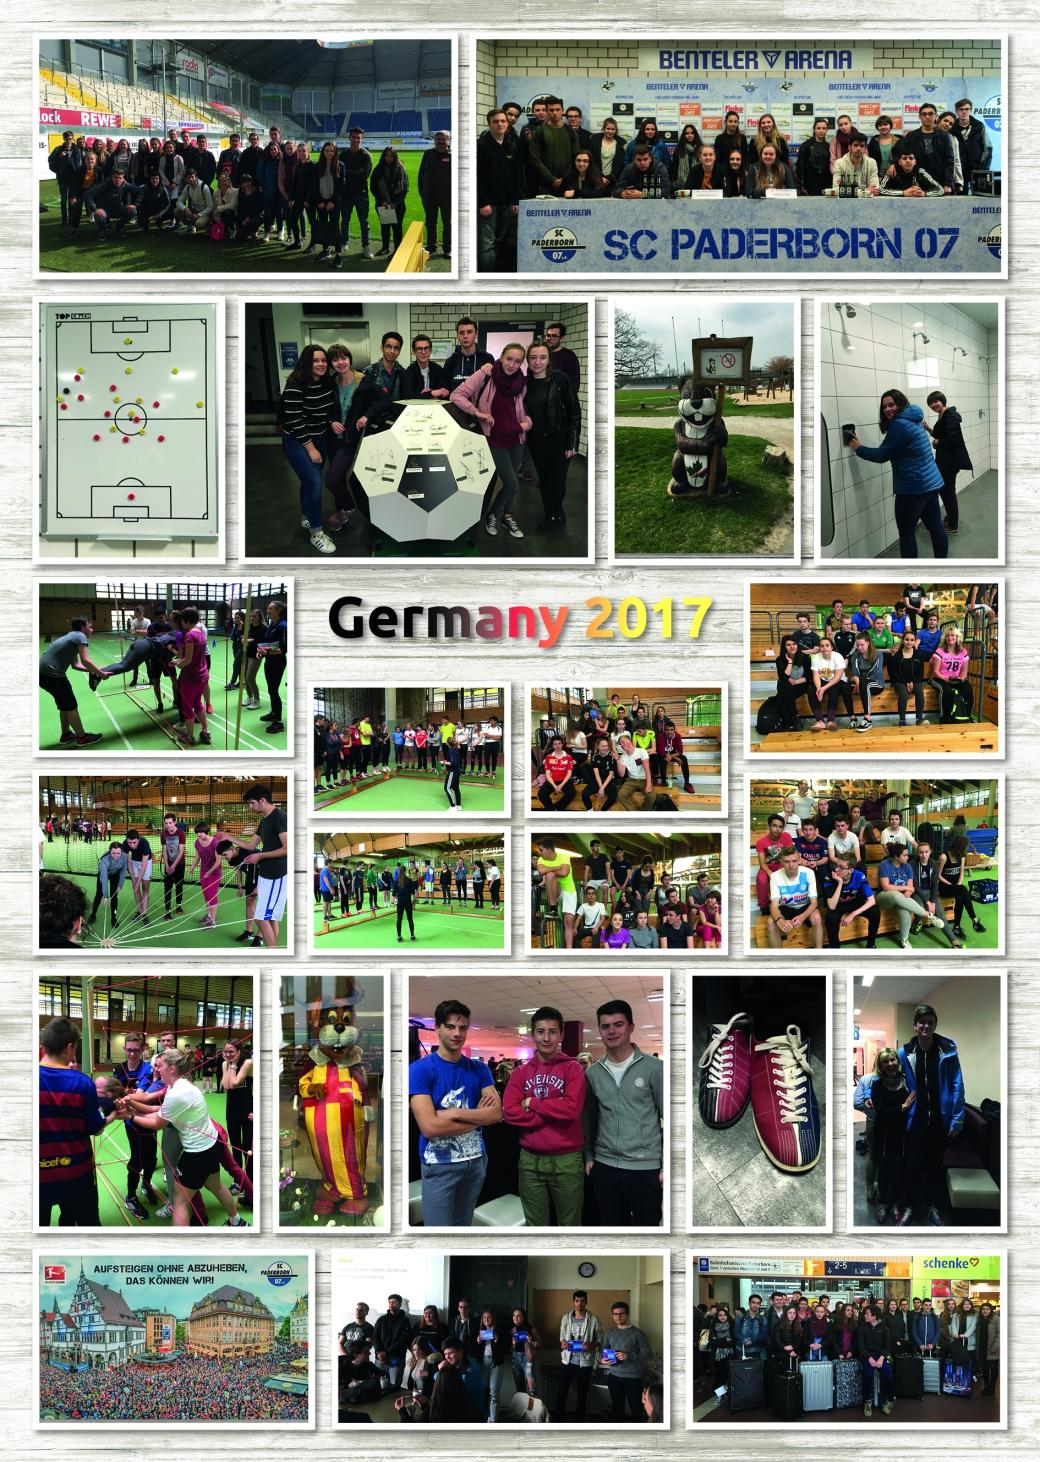 Germany-2017-3